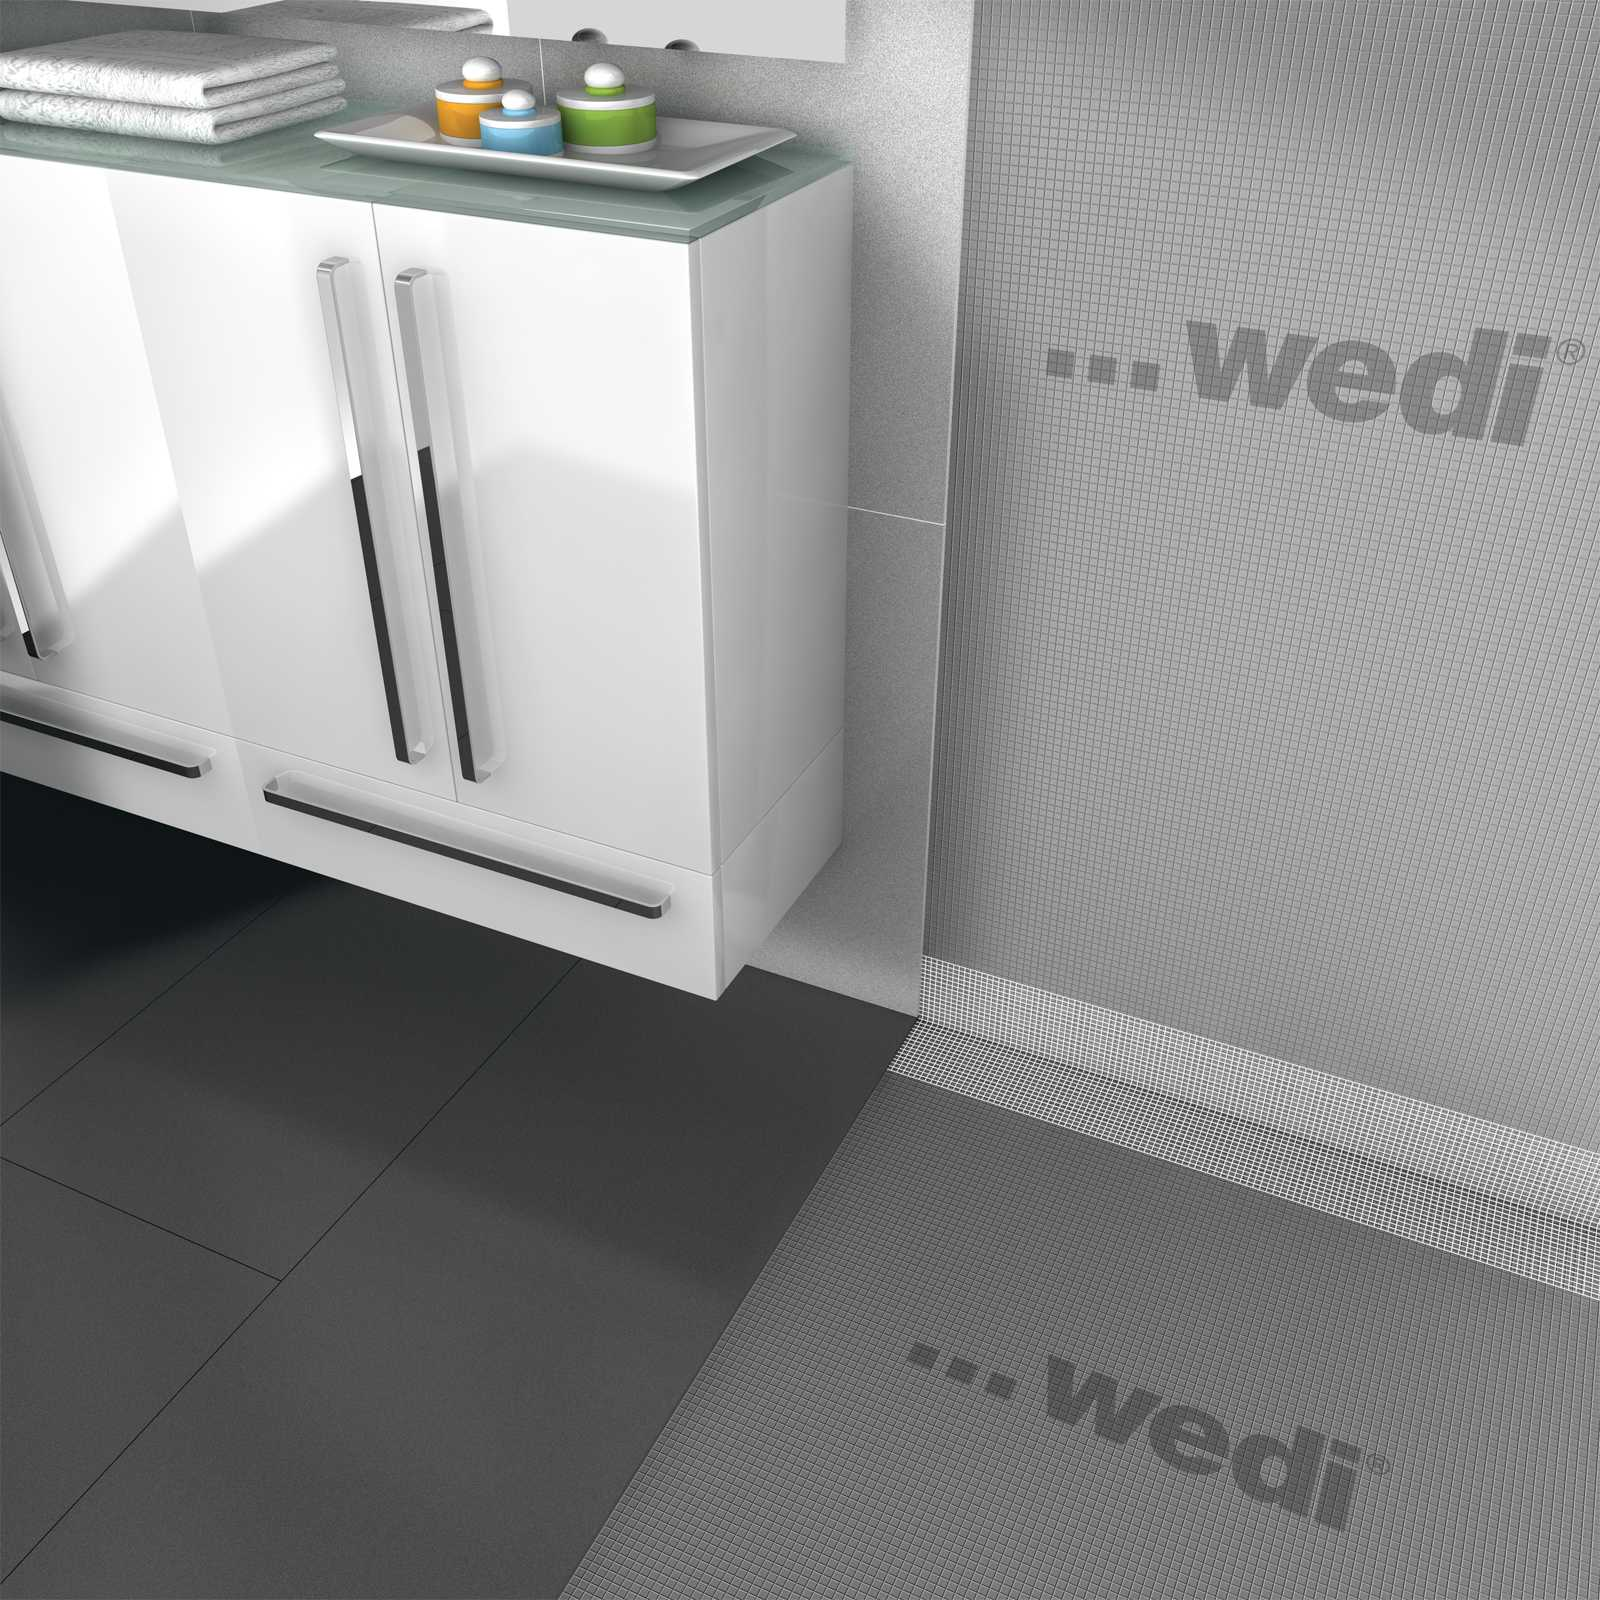 wedi tools bande d armature. Black Bedroom Furniture Sets. Home Design Ideas